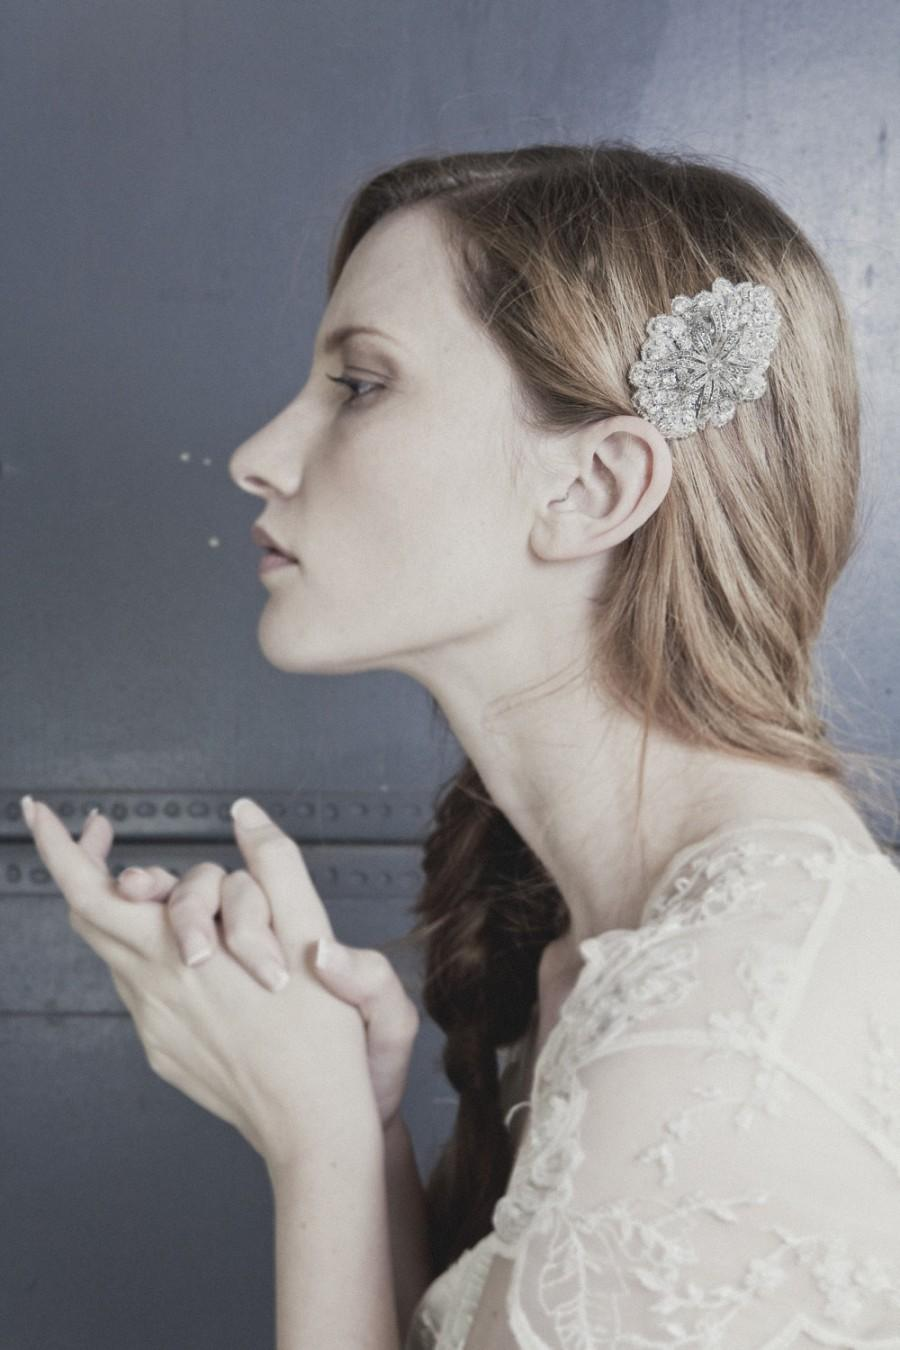 Wedding - Bijoux small rhinestone bridal wedding headband or comb with vintage brooch centrepiece